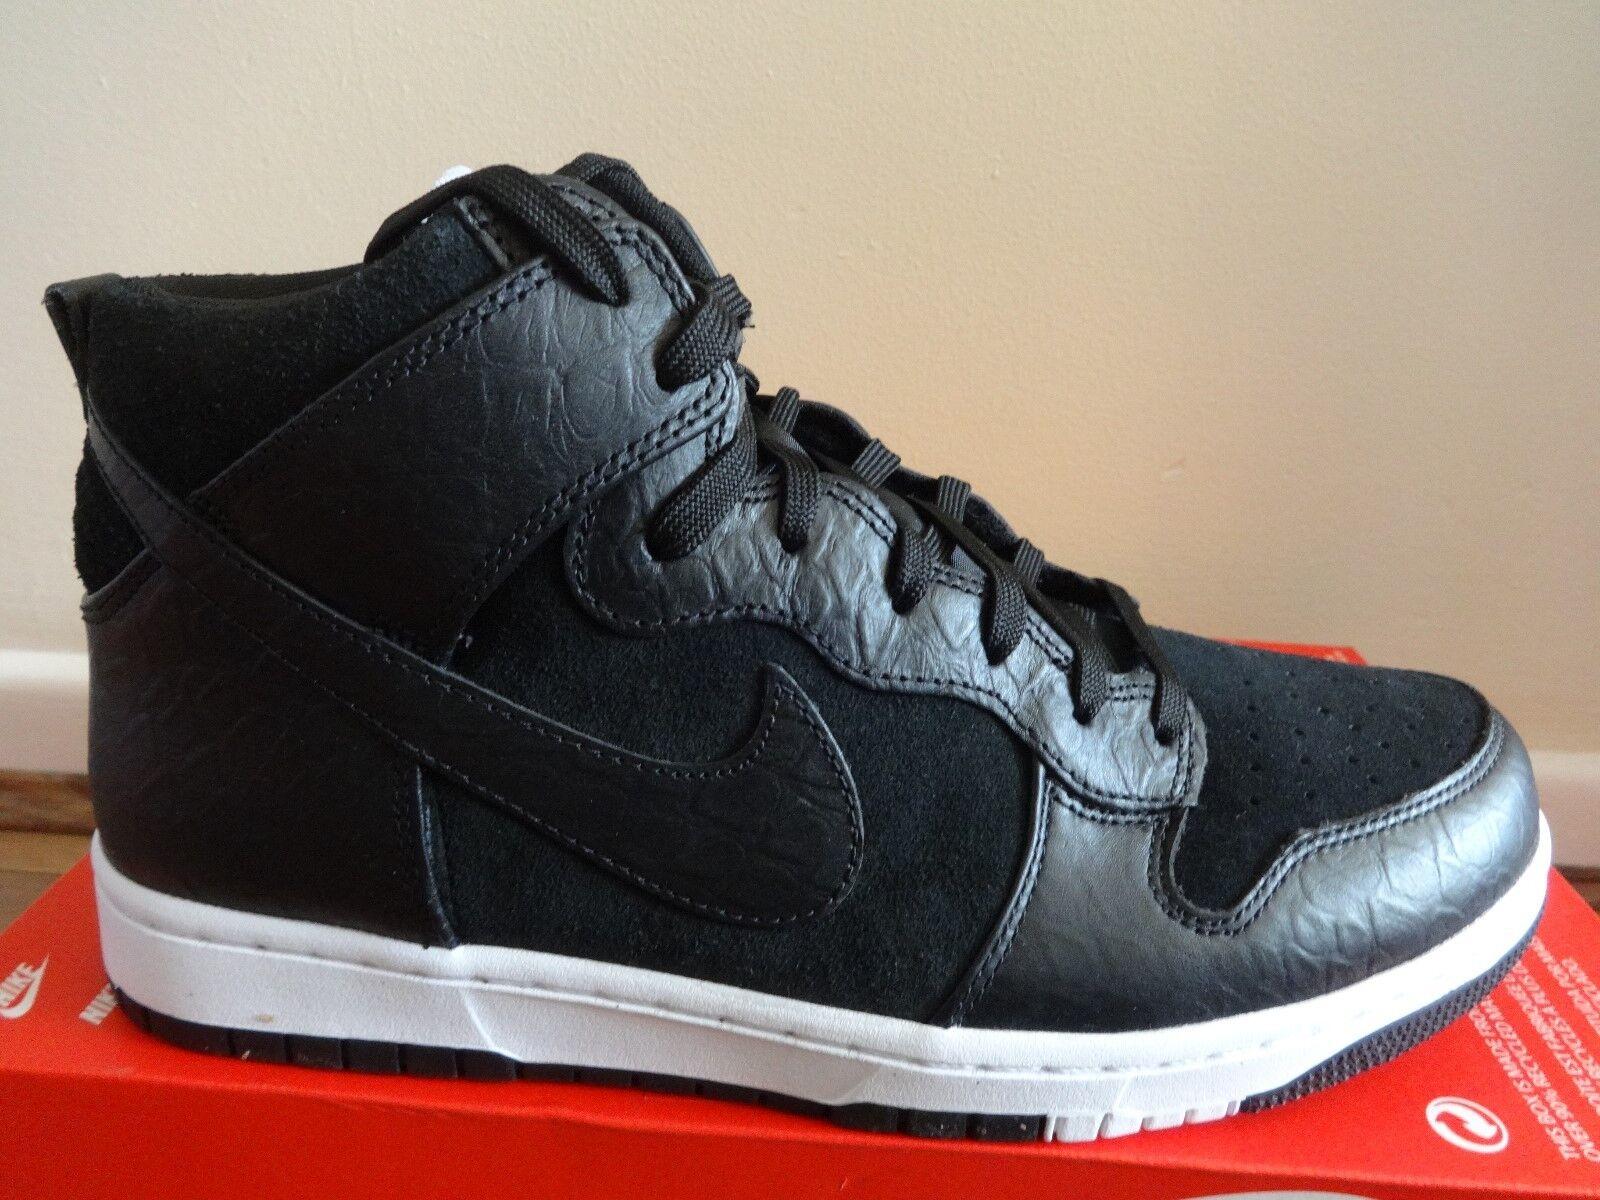 Nike Dunk CMFT PRM mens trainers sneakers 705433 705433 705433 001 uk 8 eu 42.5 us 9 NEW. 1e5aba